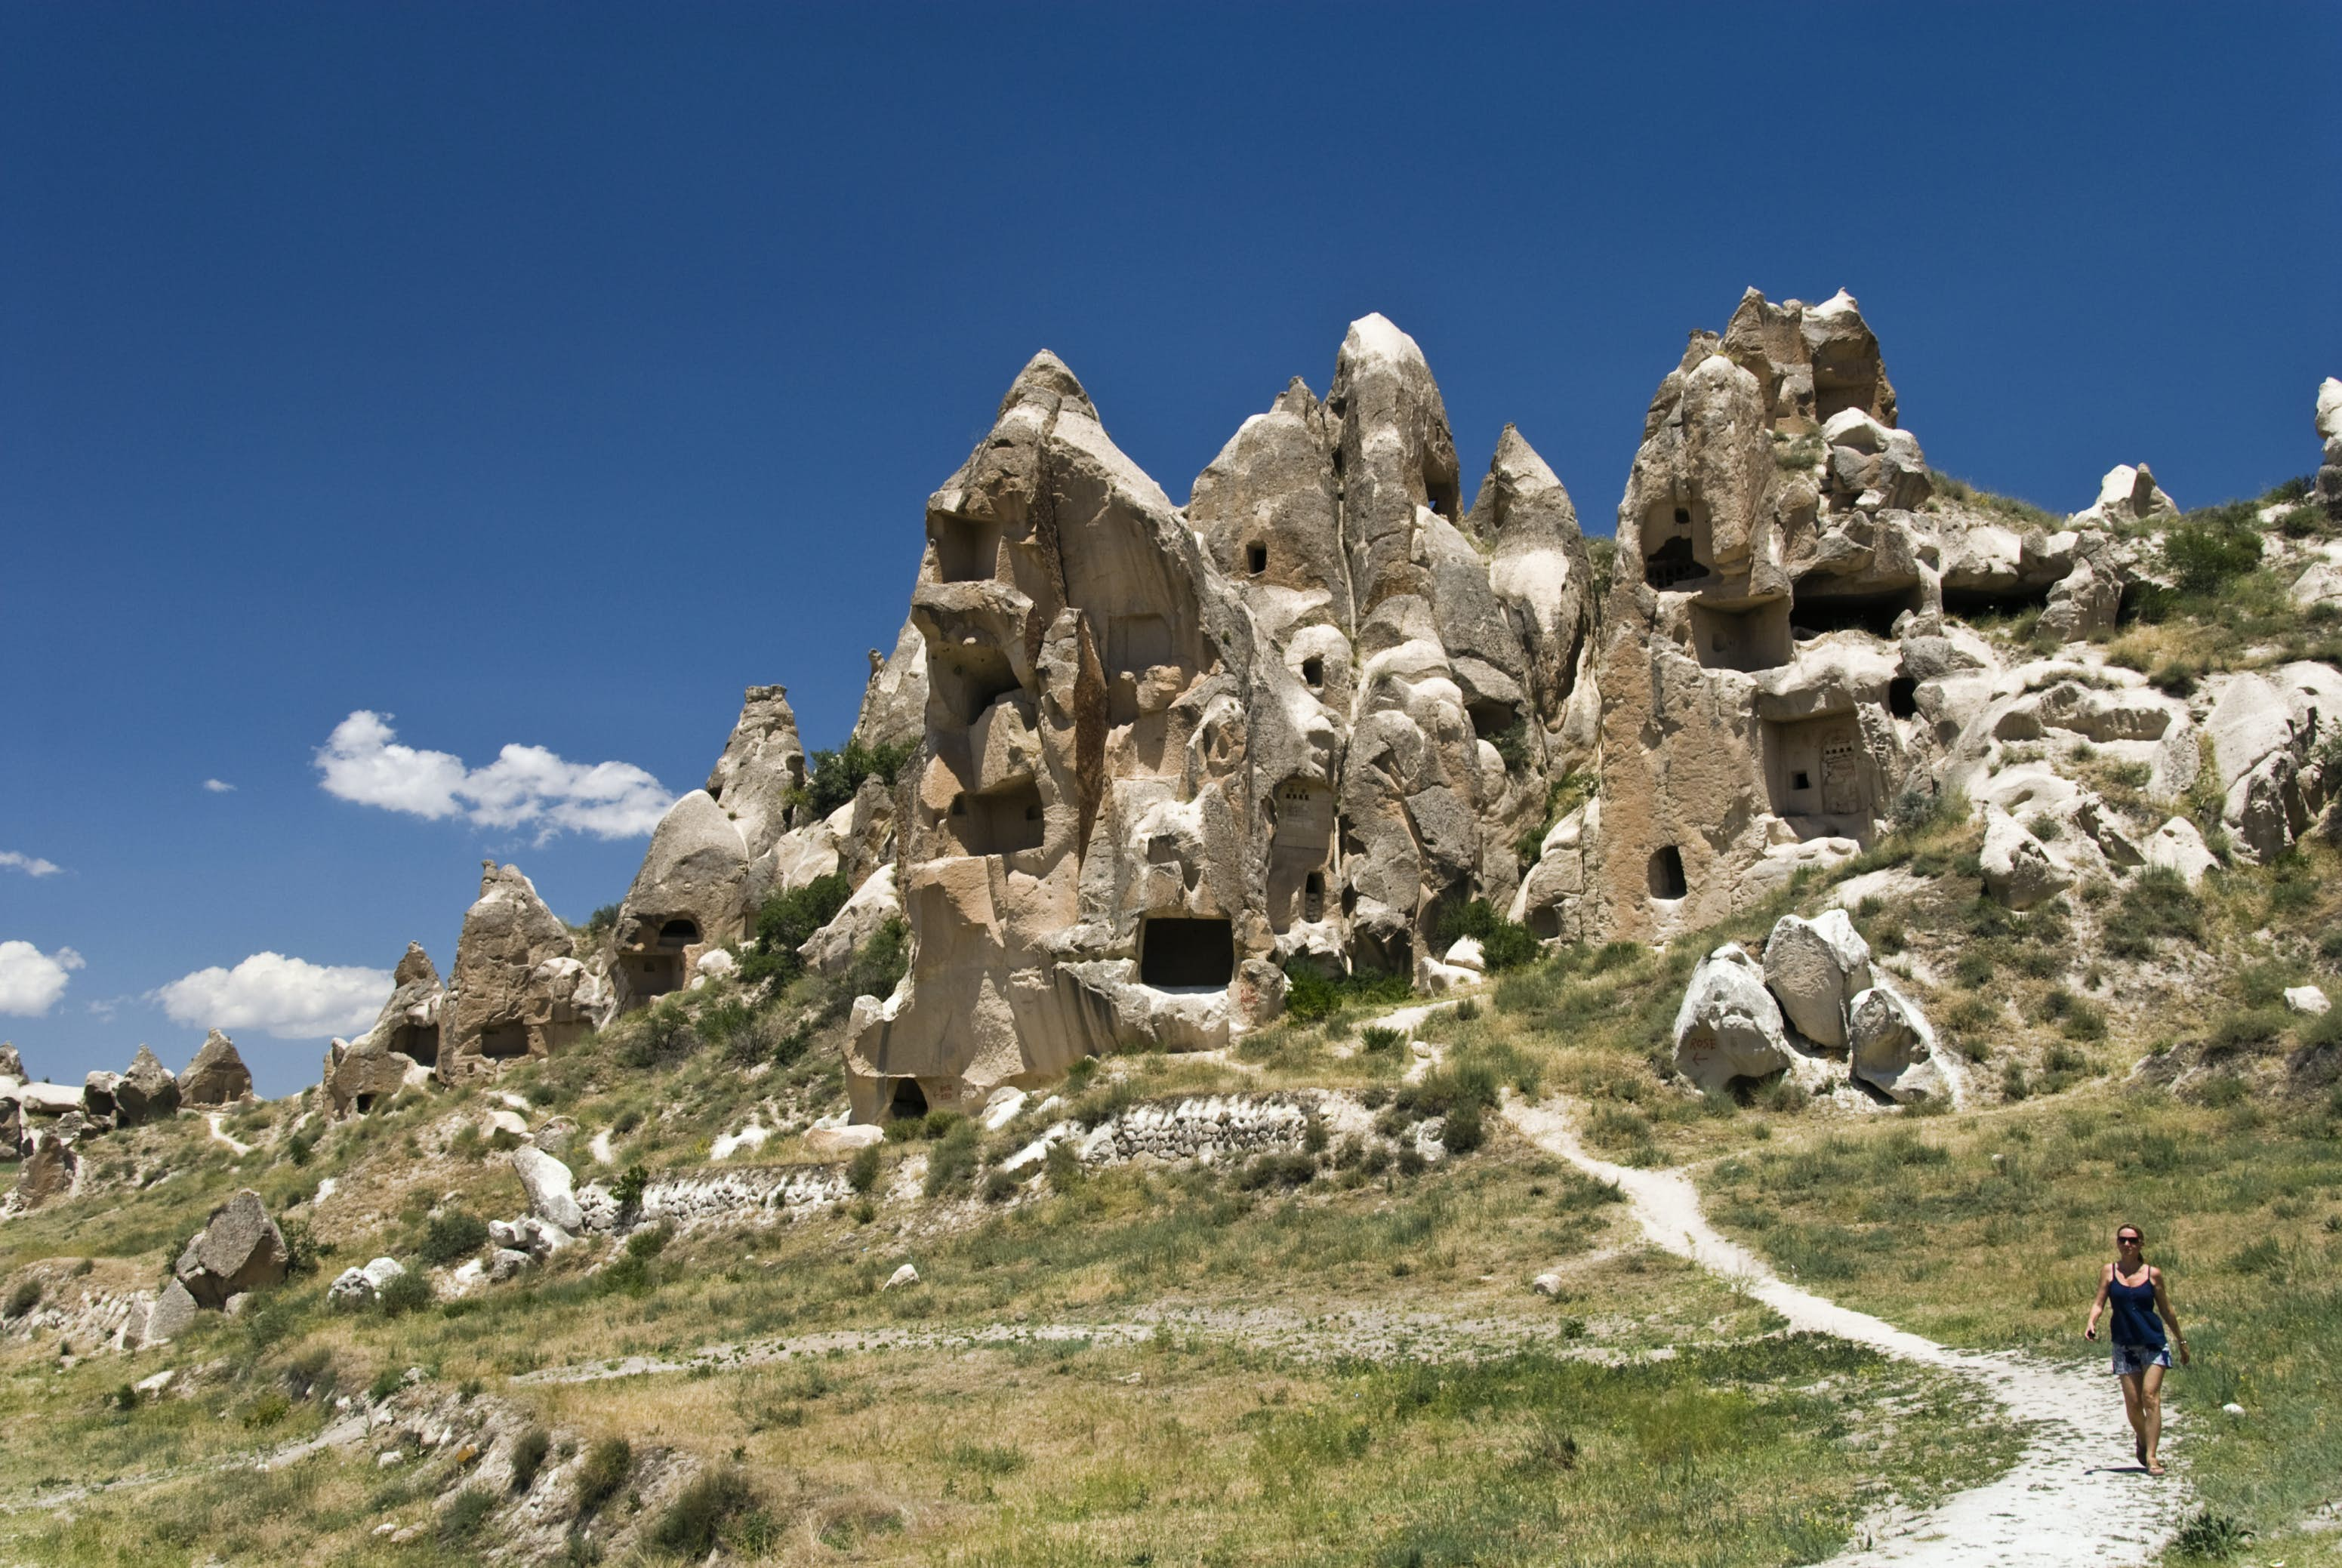 Göreme Open-Air Museum | Göreme, Turkey Attractions - Lonely Planet